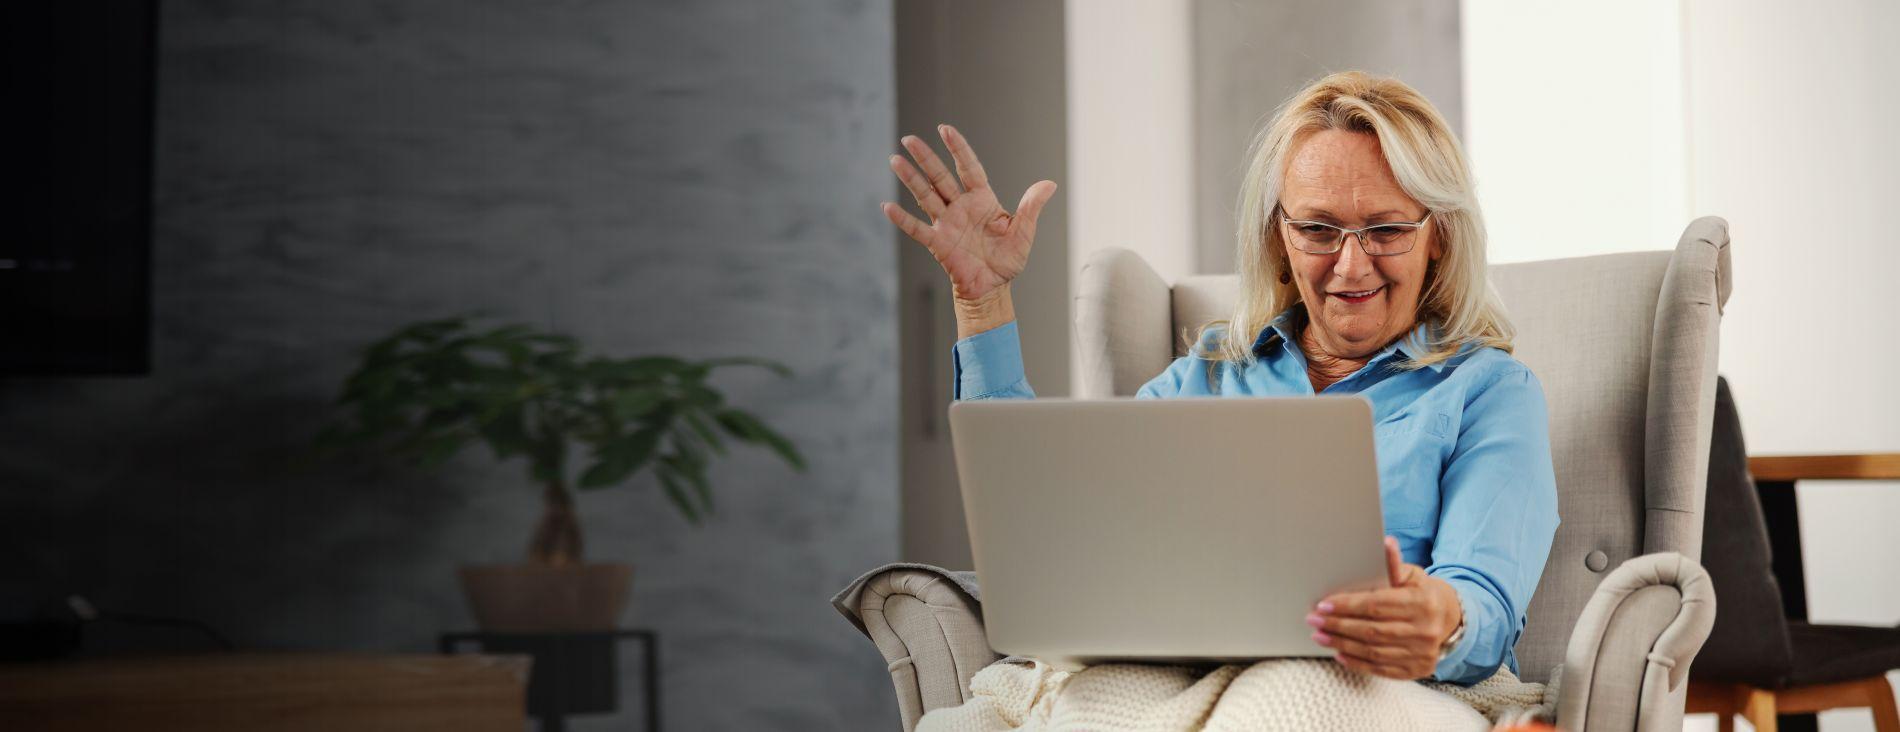 Кредит для пенсионеров под залог недвижимости. Сумма: до 11 700 000